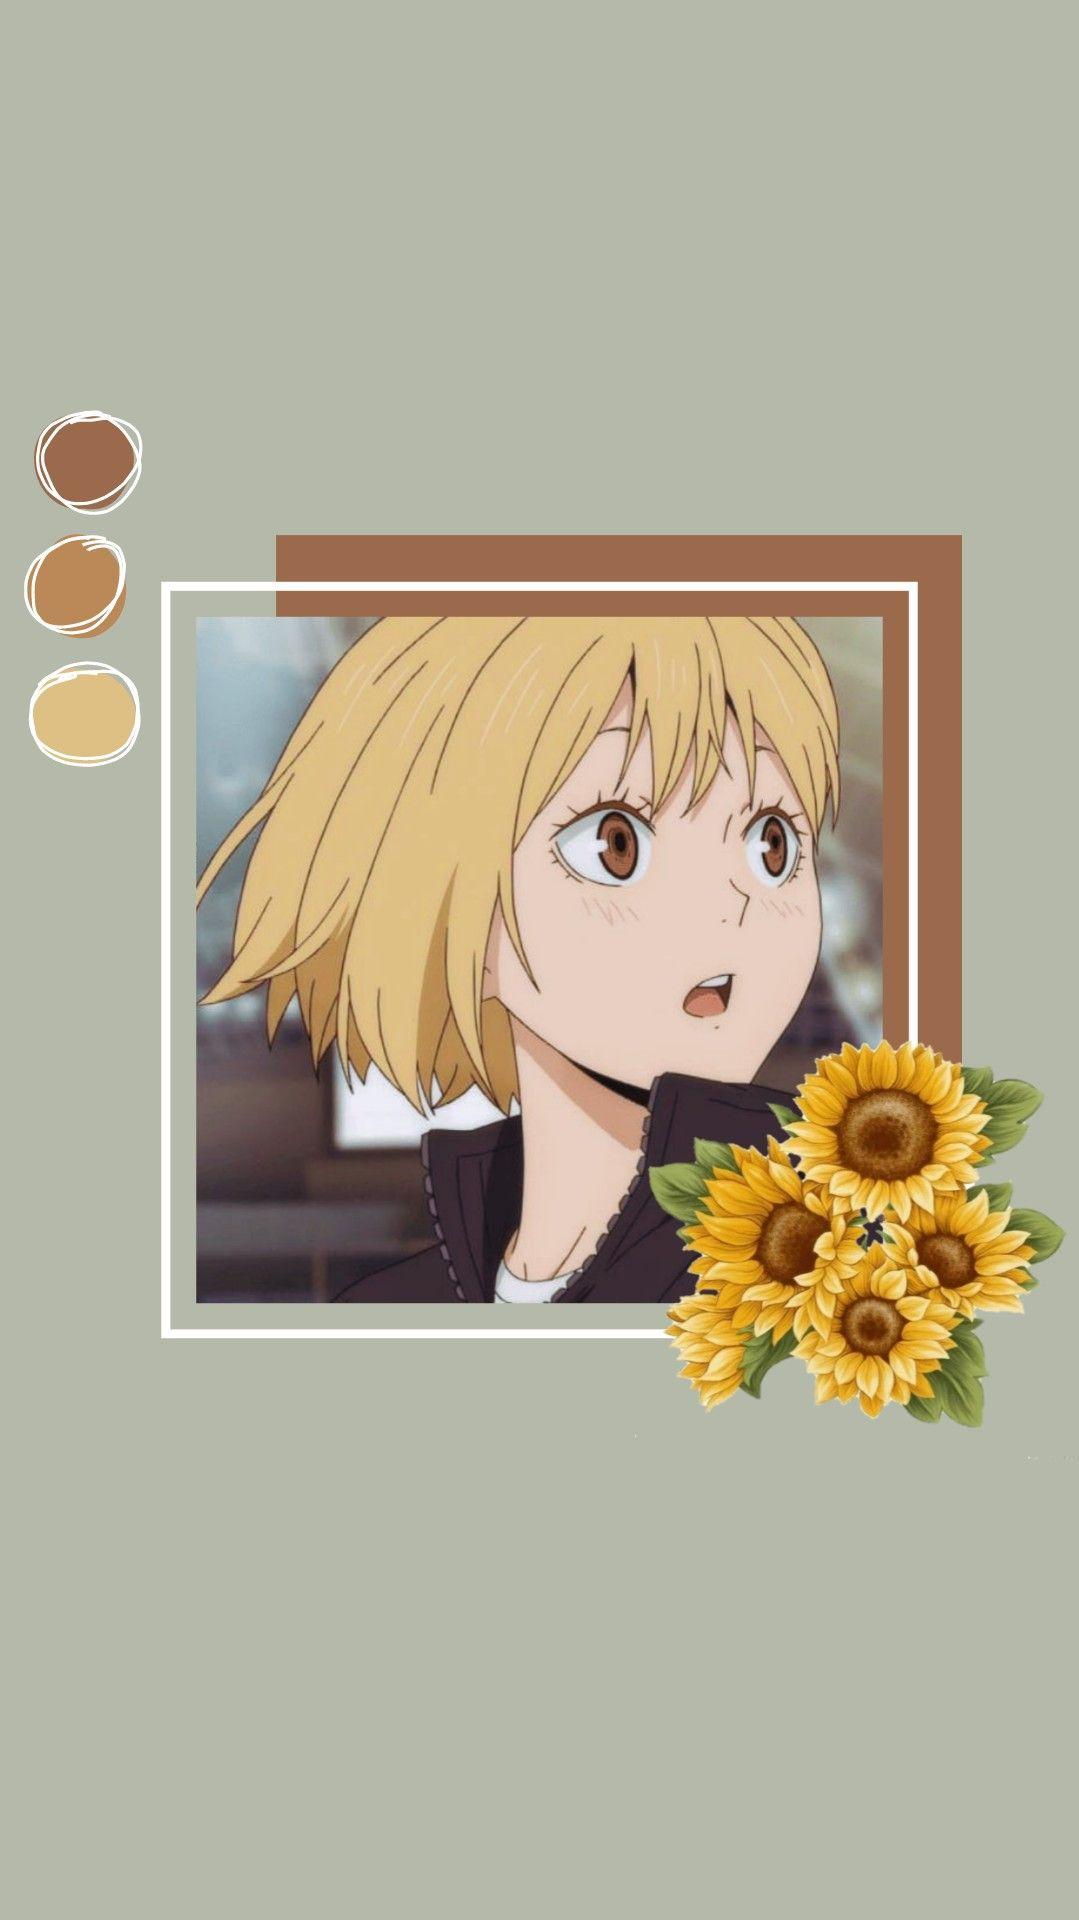 𝓨𝓪𝓬𝓱𝓲 𝓗𝓲𝓽𝓸𝓴𝓪 Haikyuu Wallpaper Haikyuu Anime Anime Wallpaper